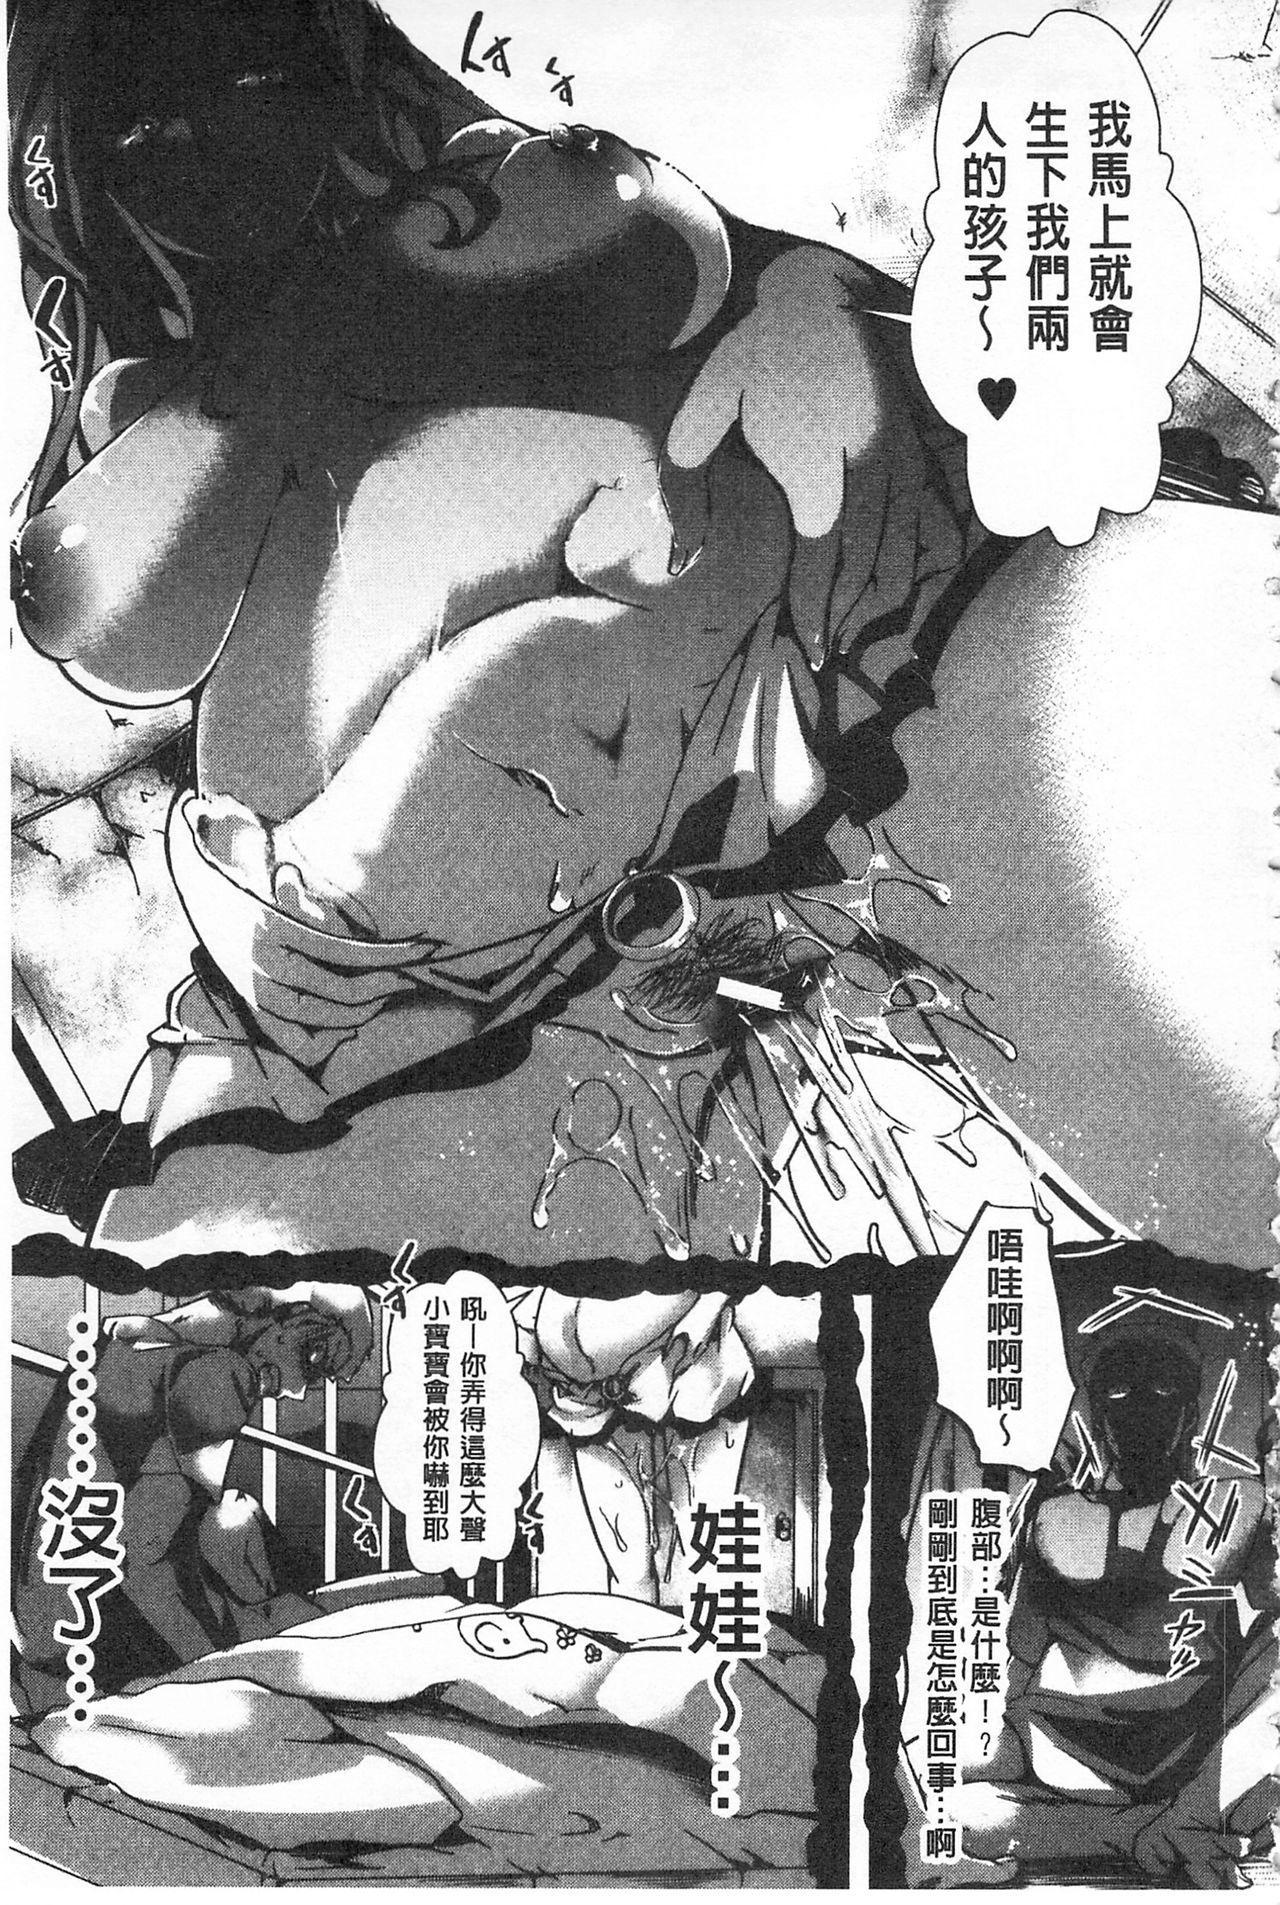 [hal] Daienjou -Ikare Ikasare Iki Ikare-   ∞艶嬢 -洩出來被搞到洩掛了被搞掛-  [Chinese] 62